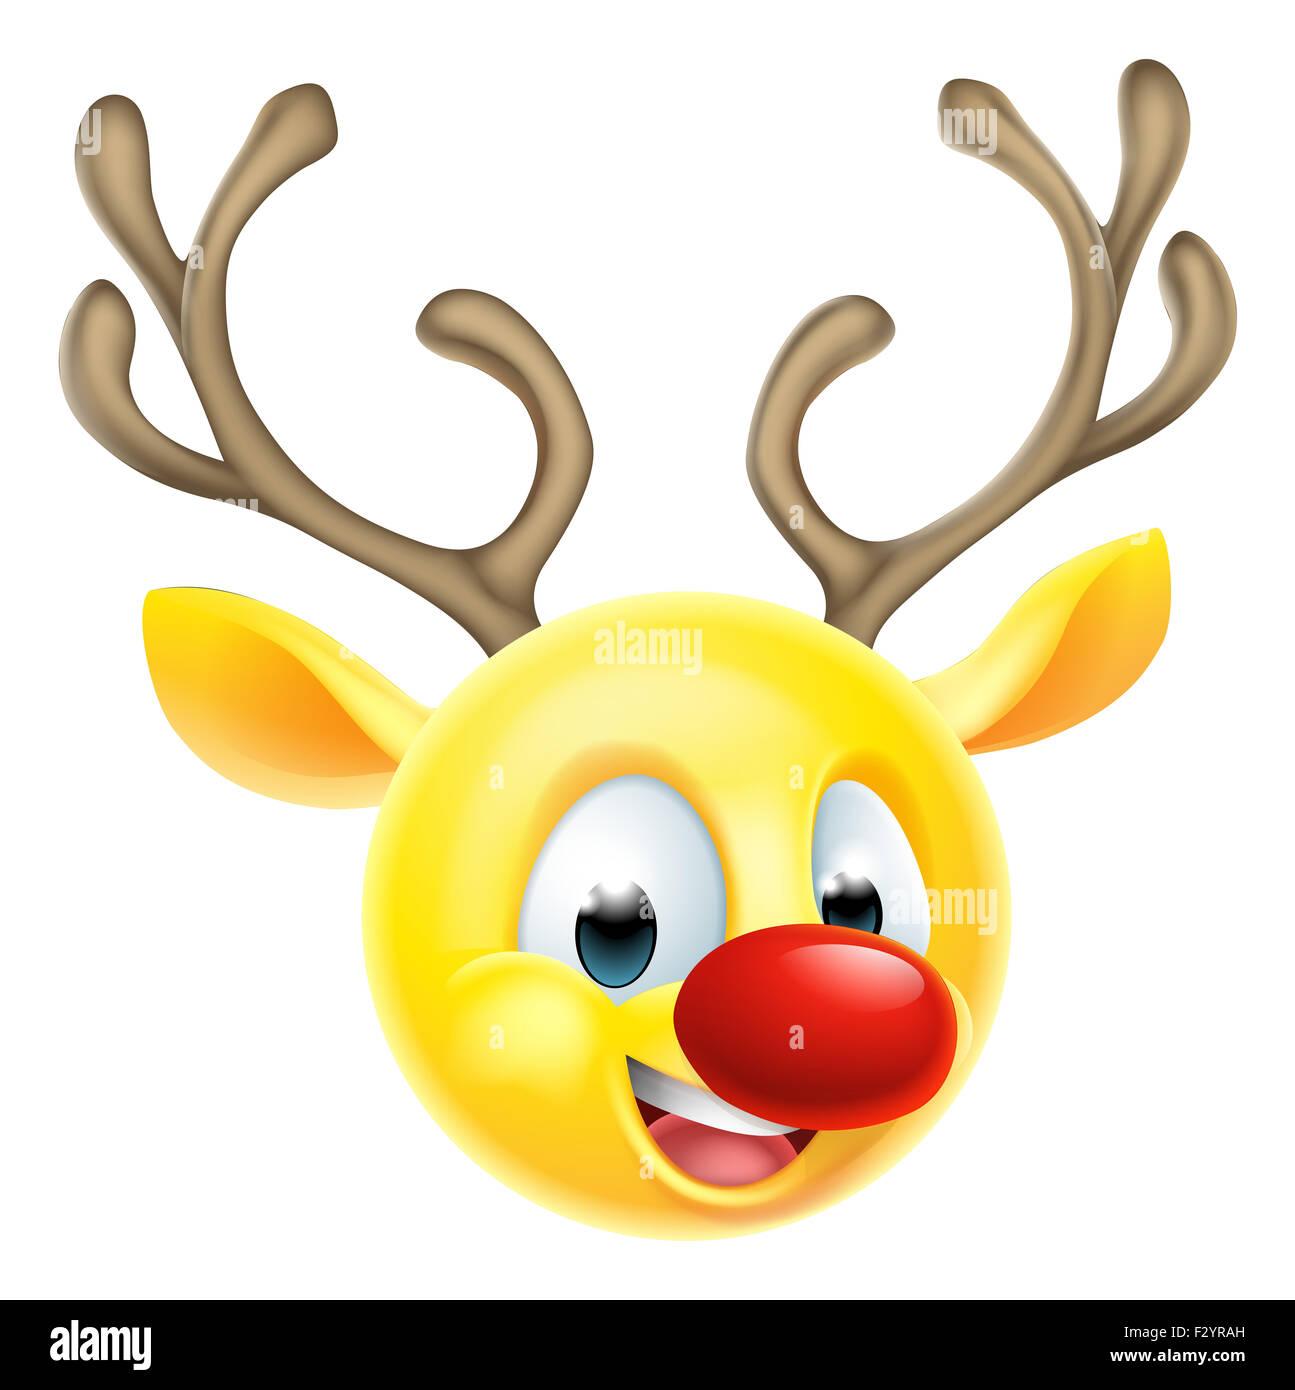 Cartoon Santas Christmas reindeer emoticon emoji character - Stock Image